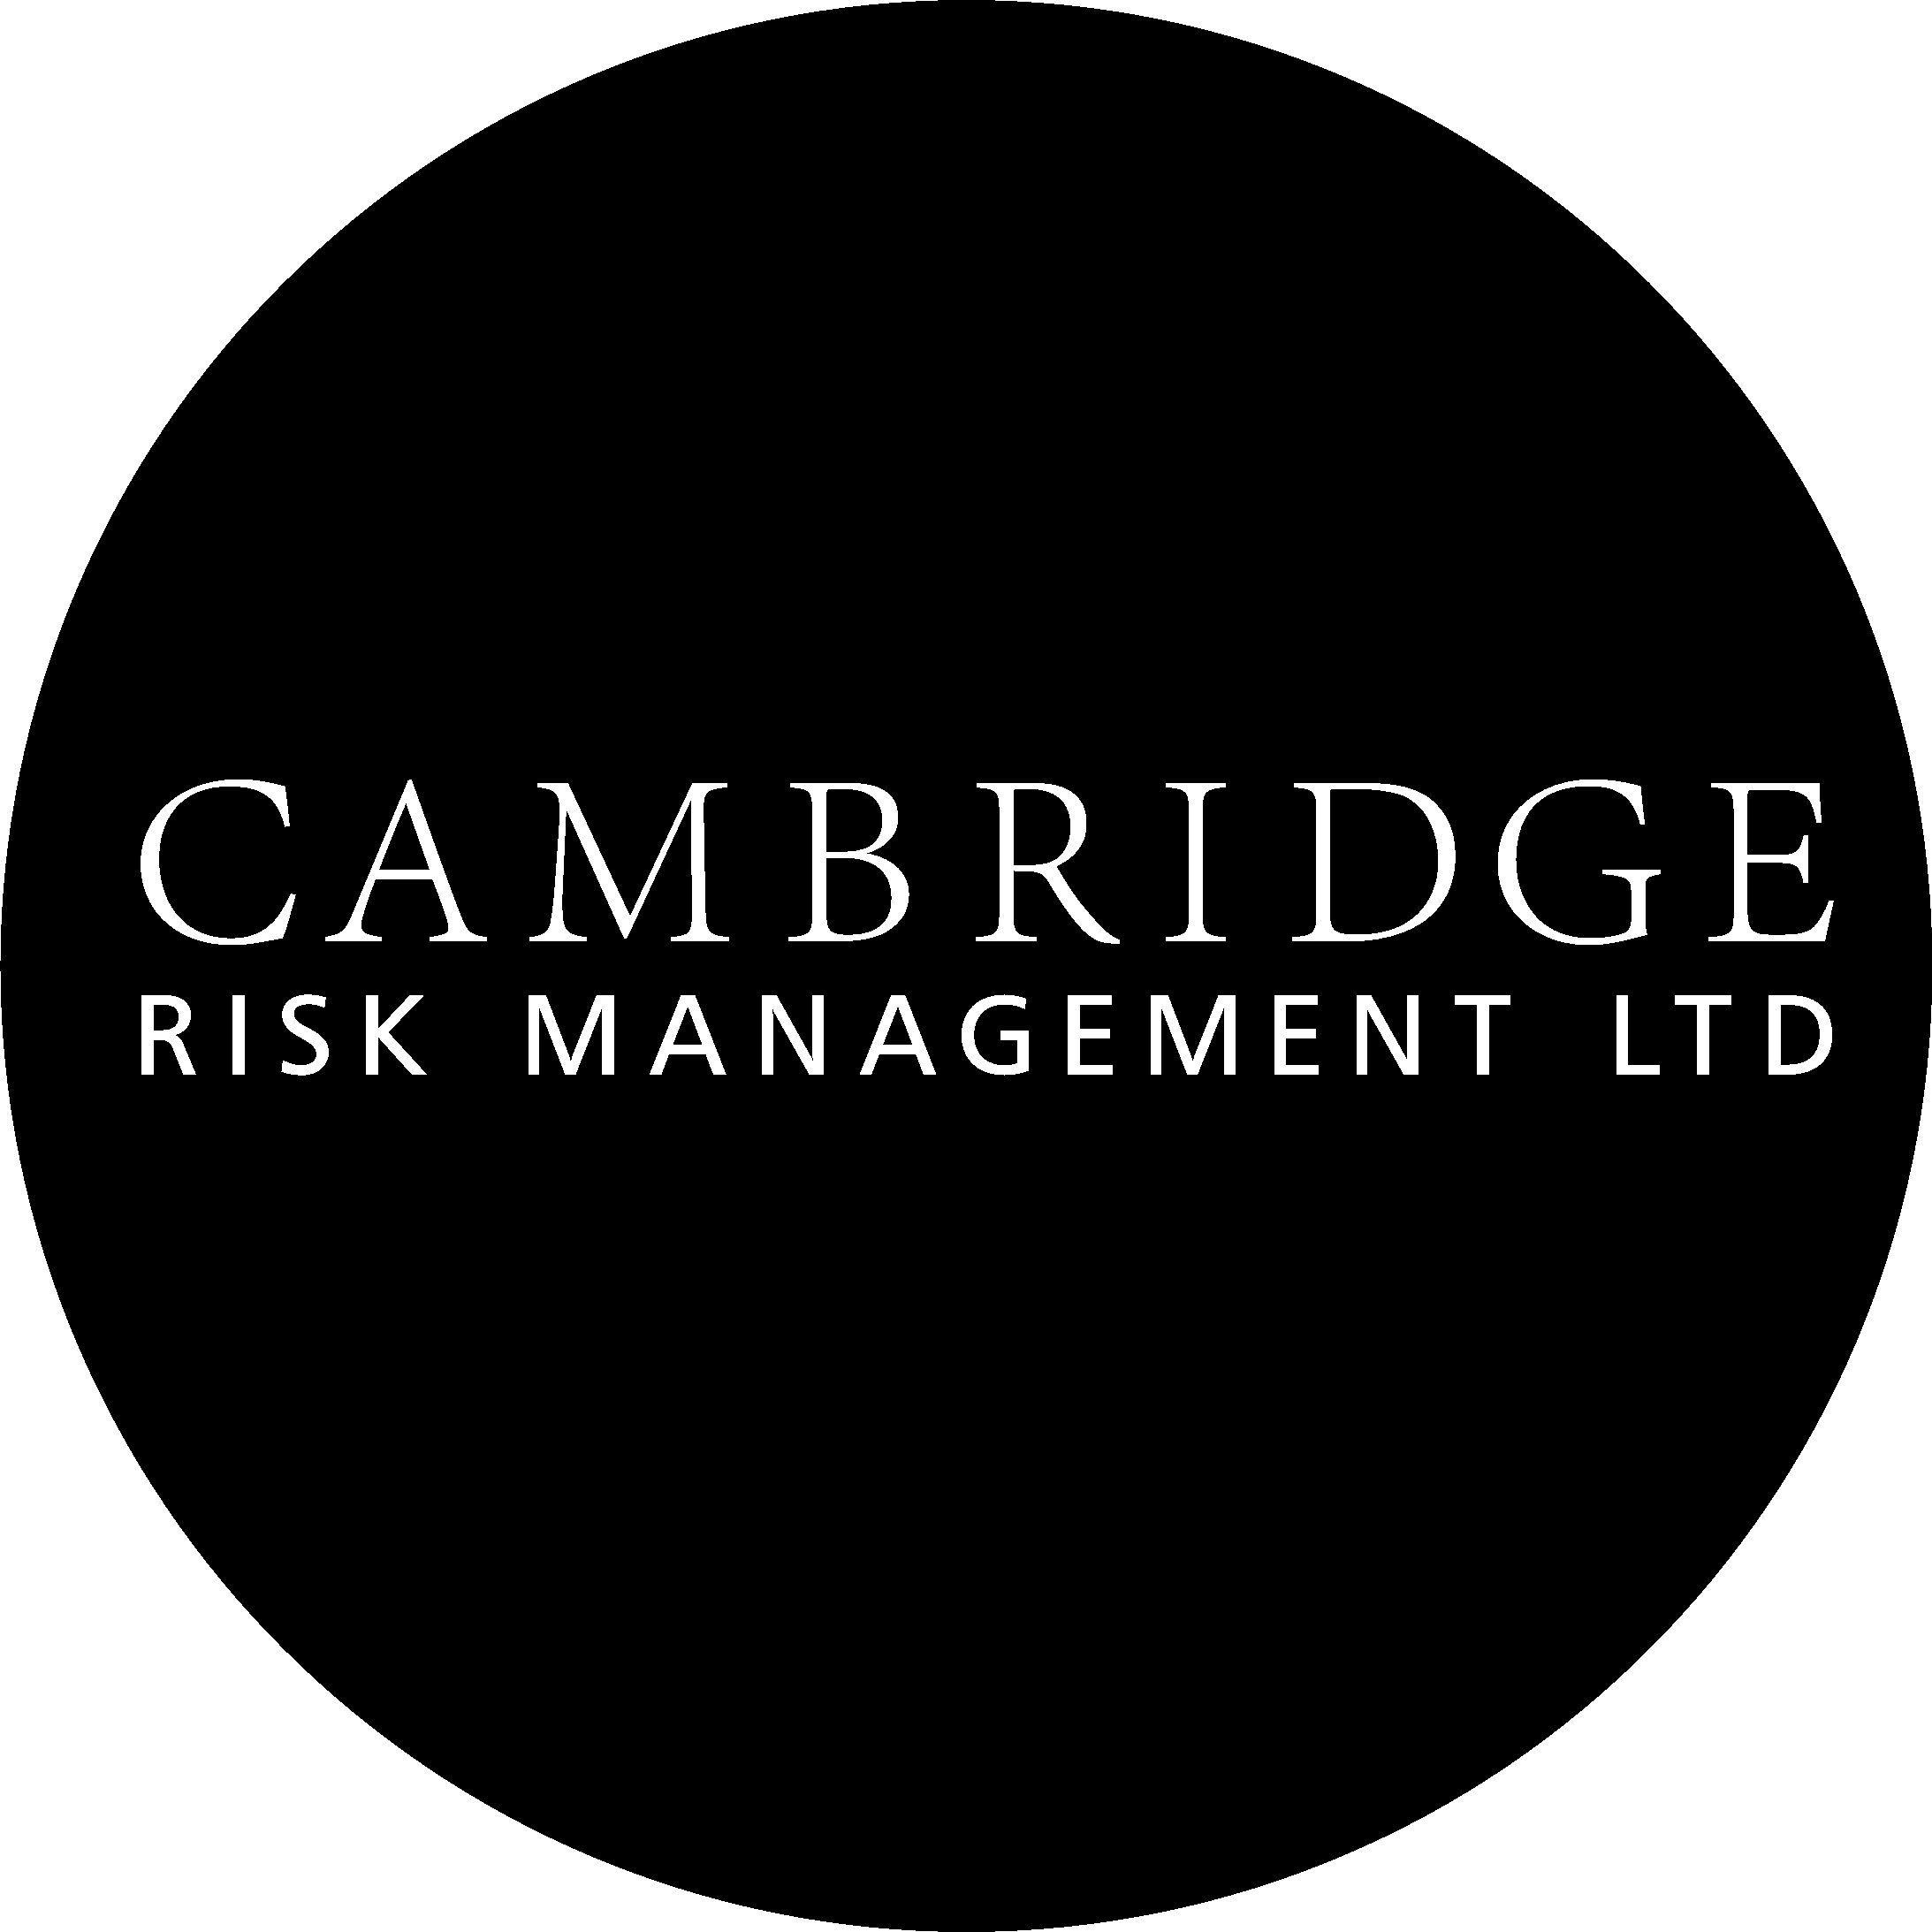 John Buckley - Cambridge Risk Management Ltd